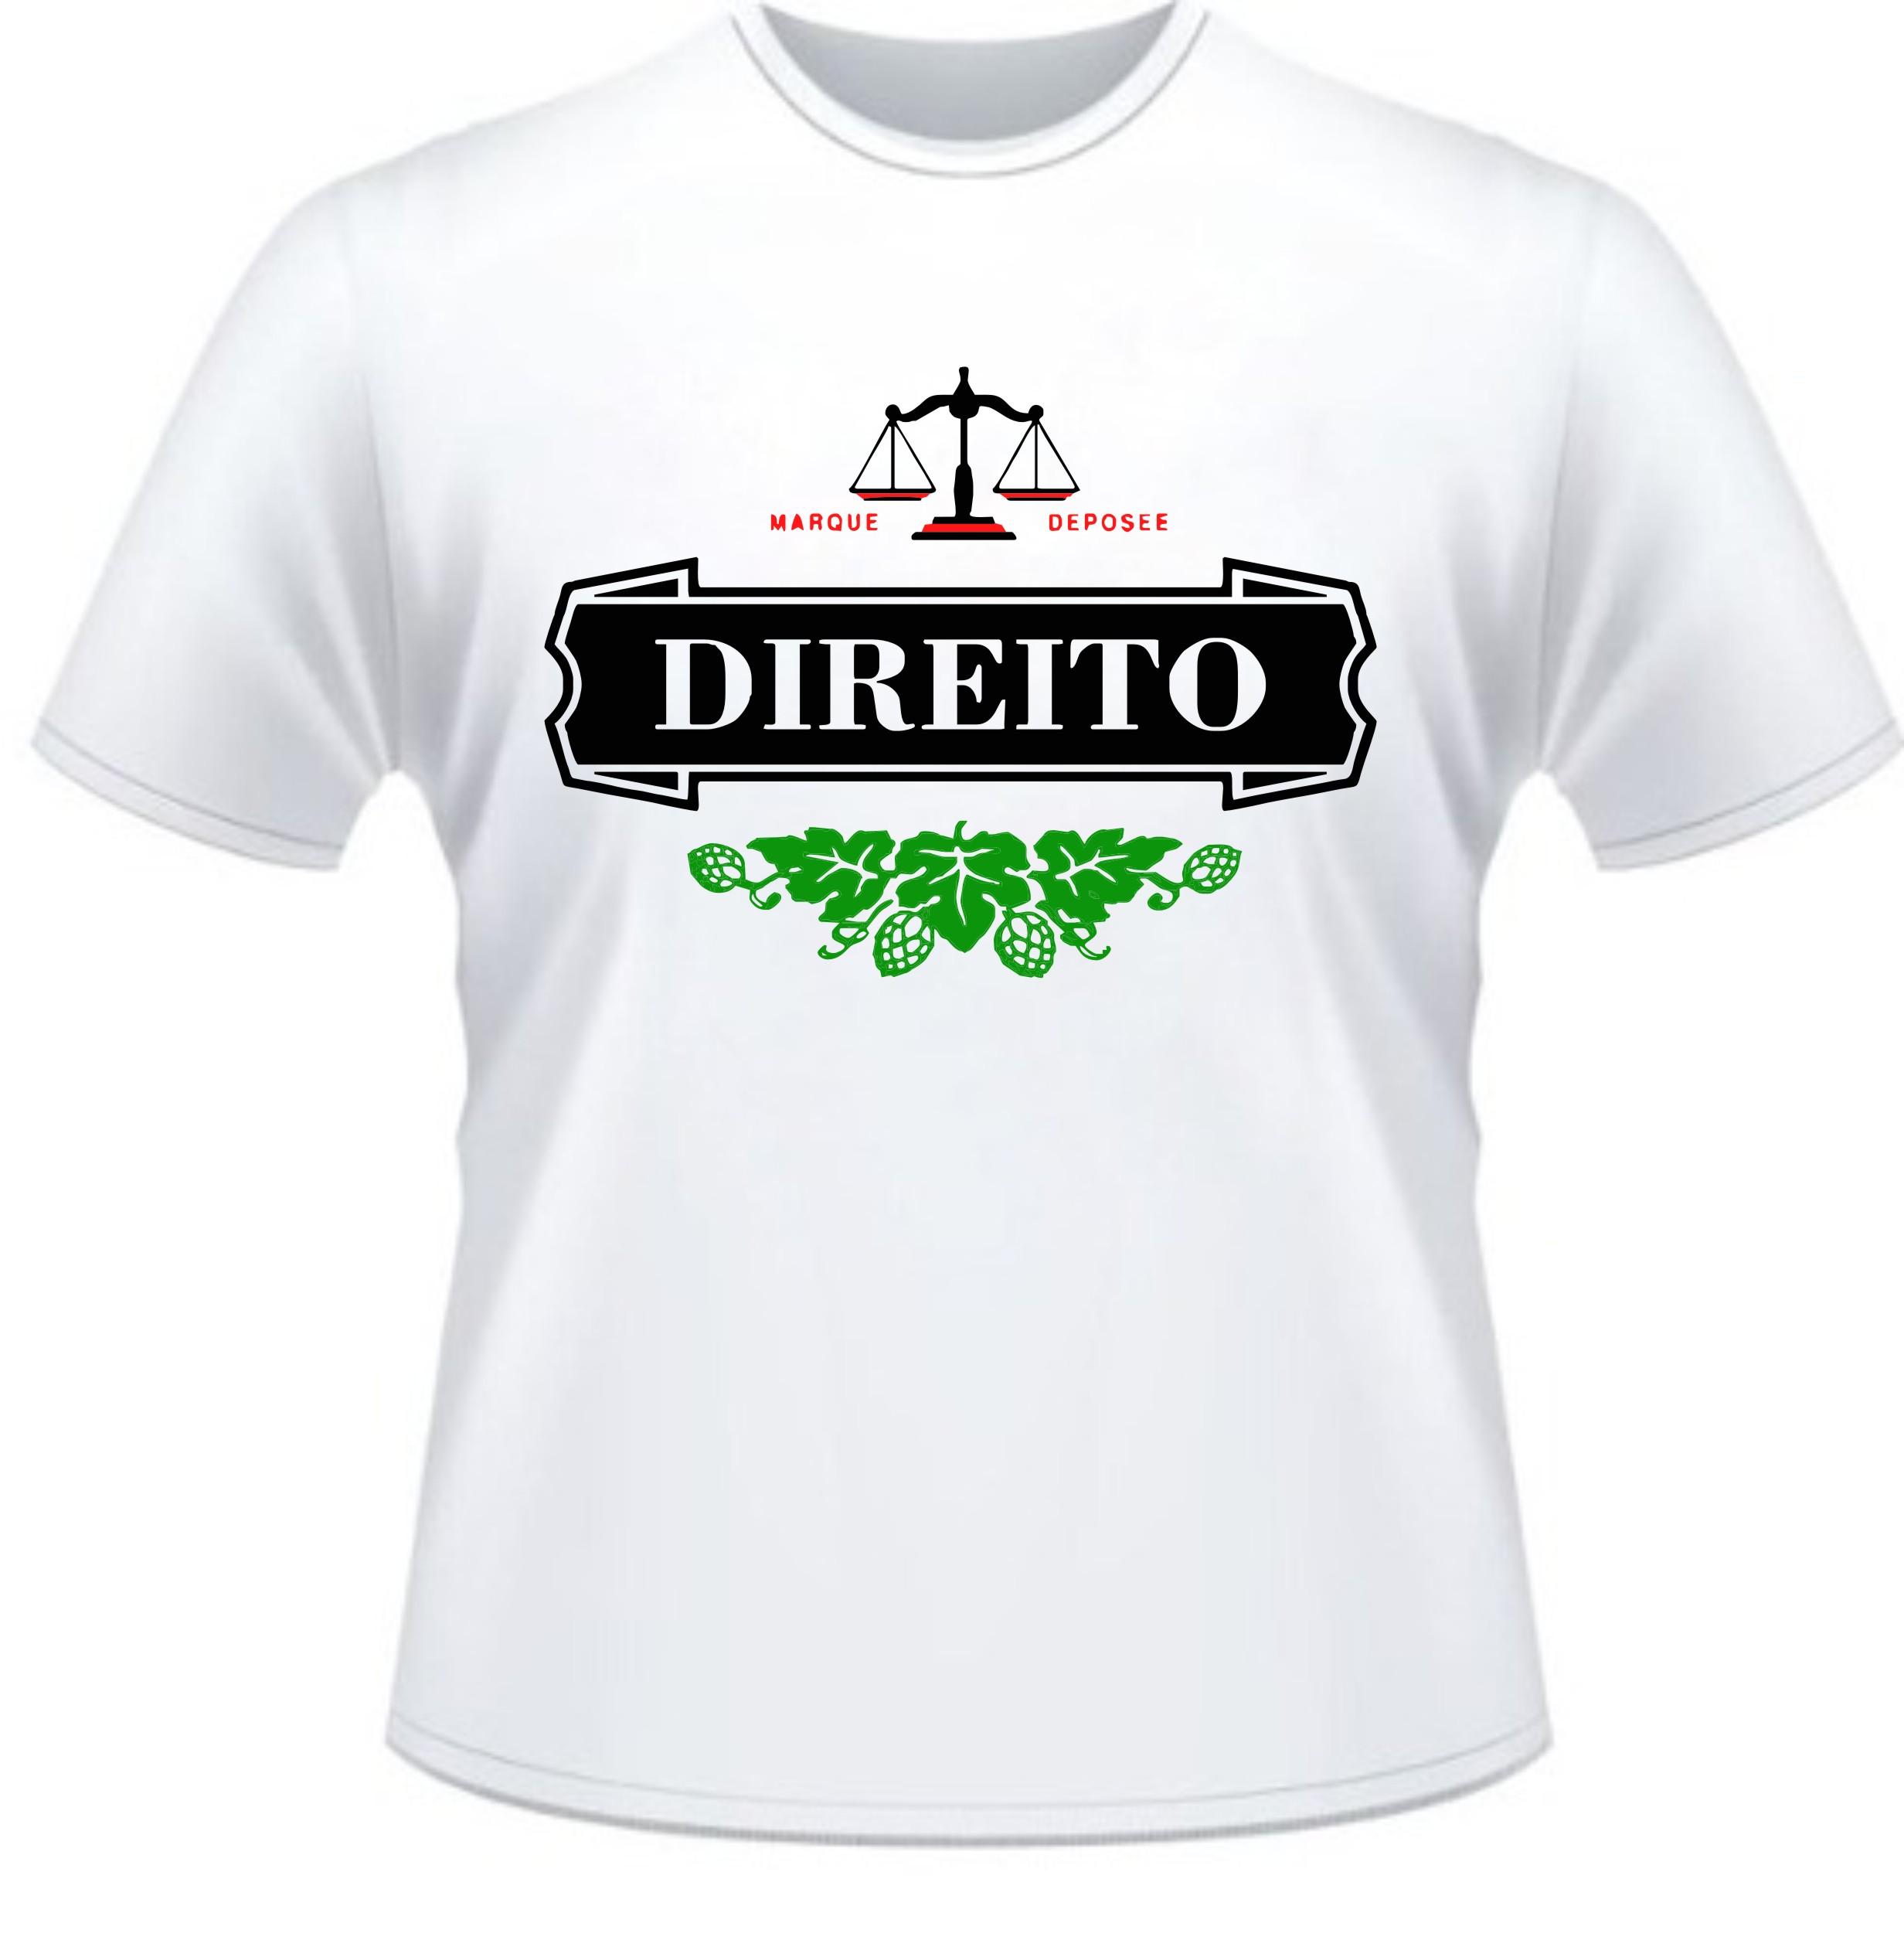 Camiseta Universitaria Heineken Curso Direito  5d72b362390f1